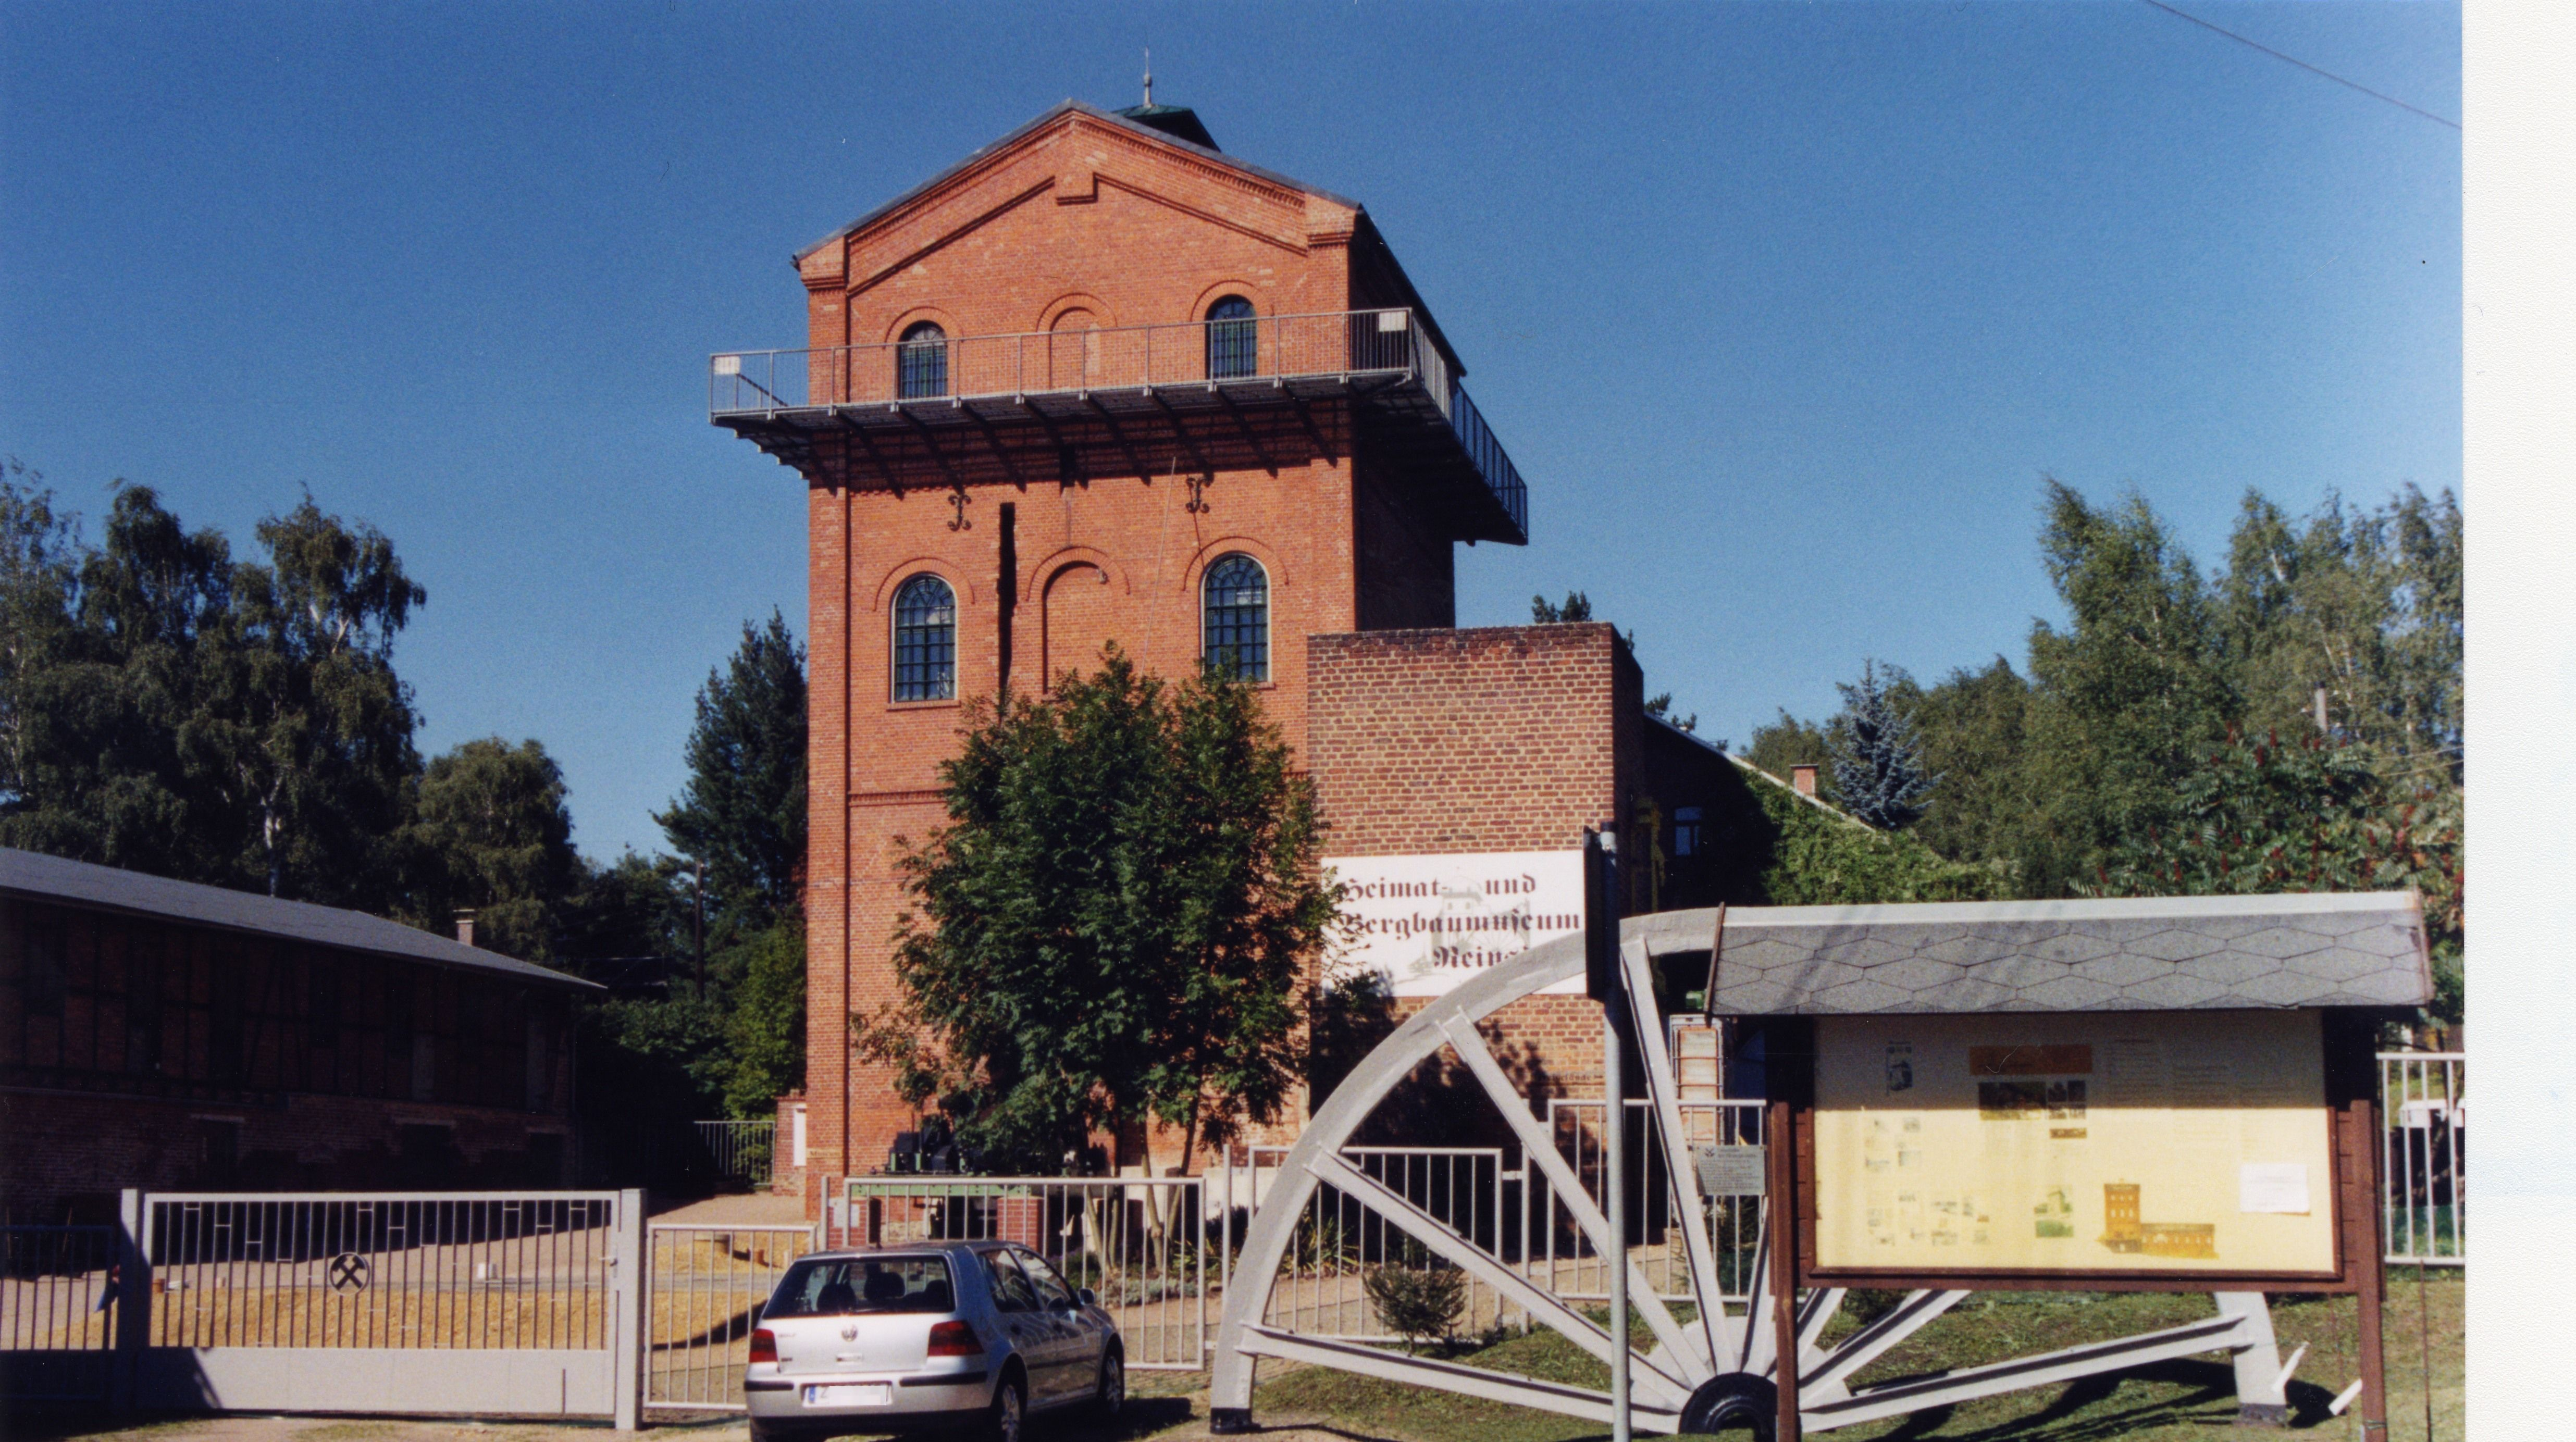 Bild von Zwickau (Landkreis): Bergbaumuseum Reinsdorf